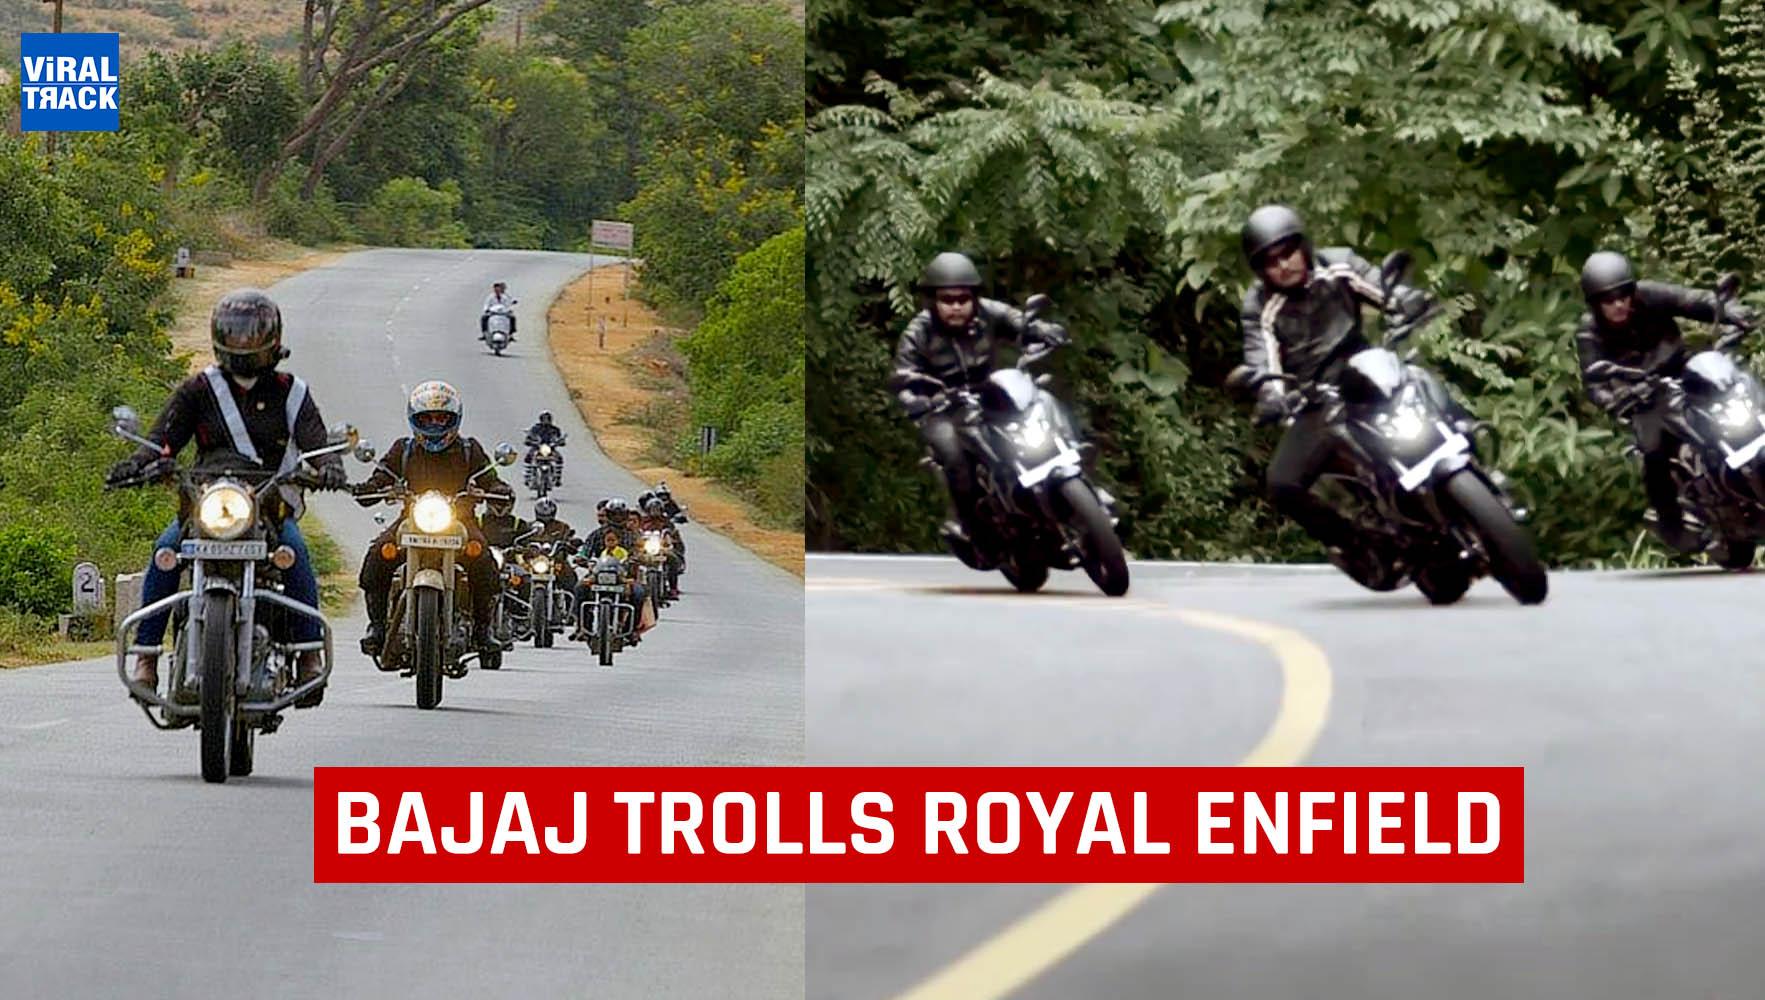 Bajaj dominar trolls royal enfield by commercial ad